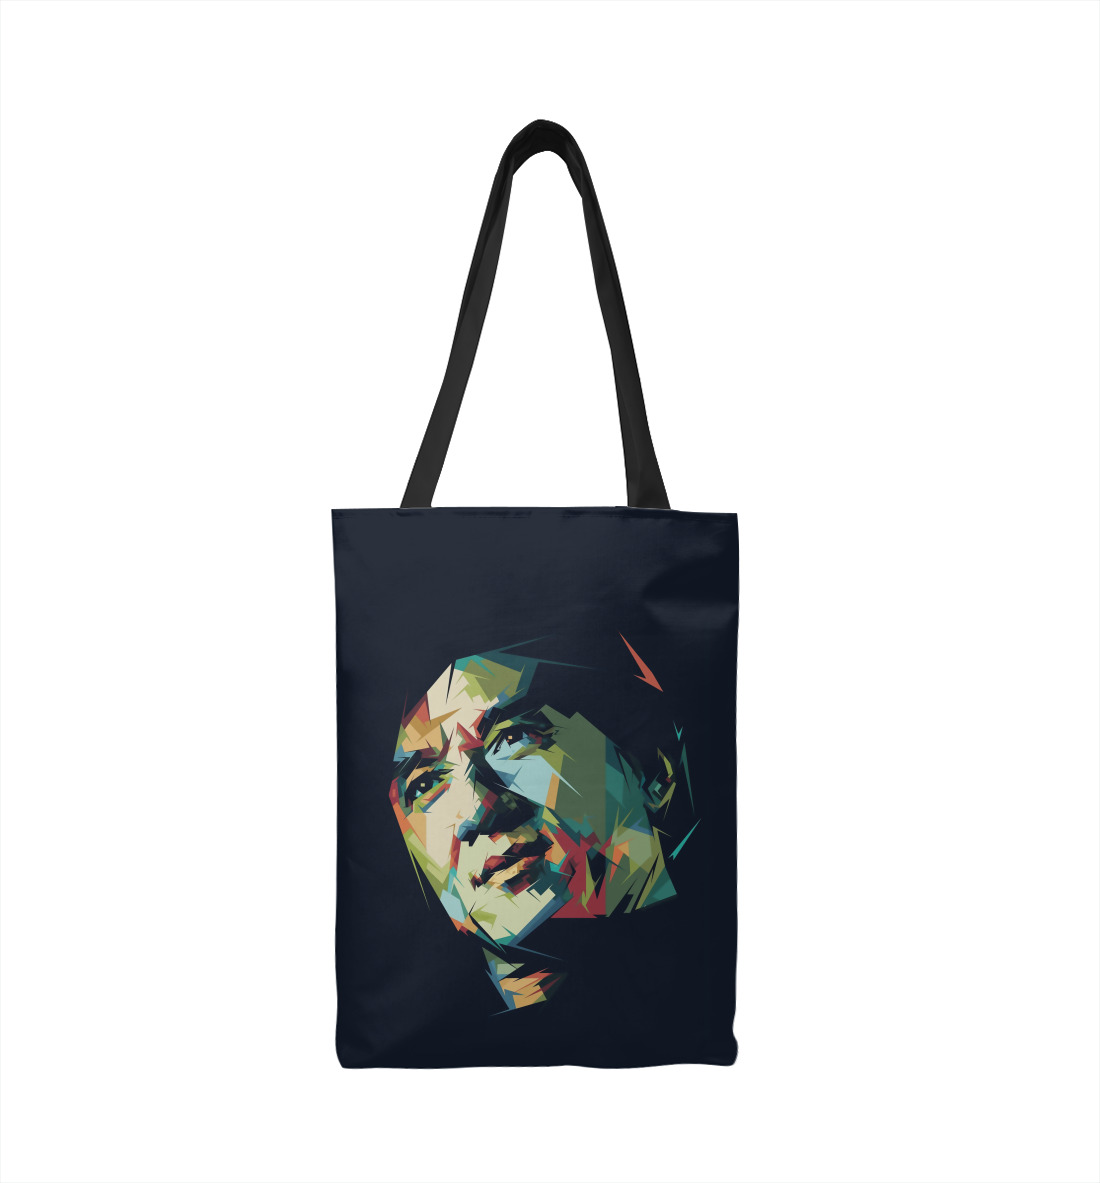 Jackie Chan judy chin chan no strangers here